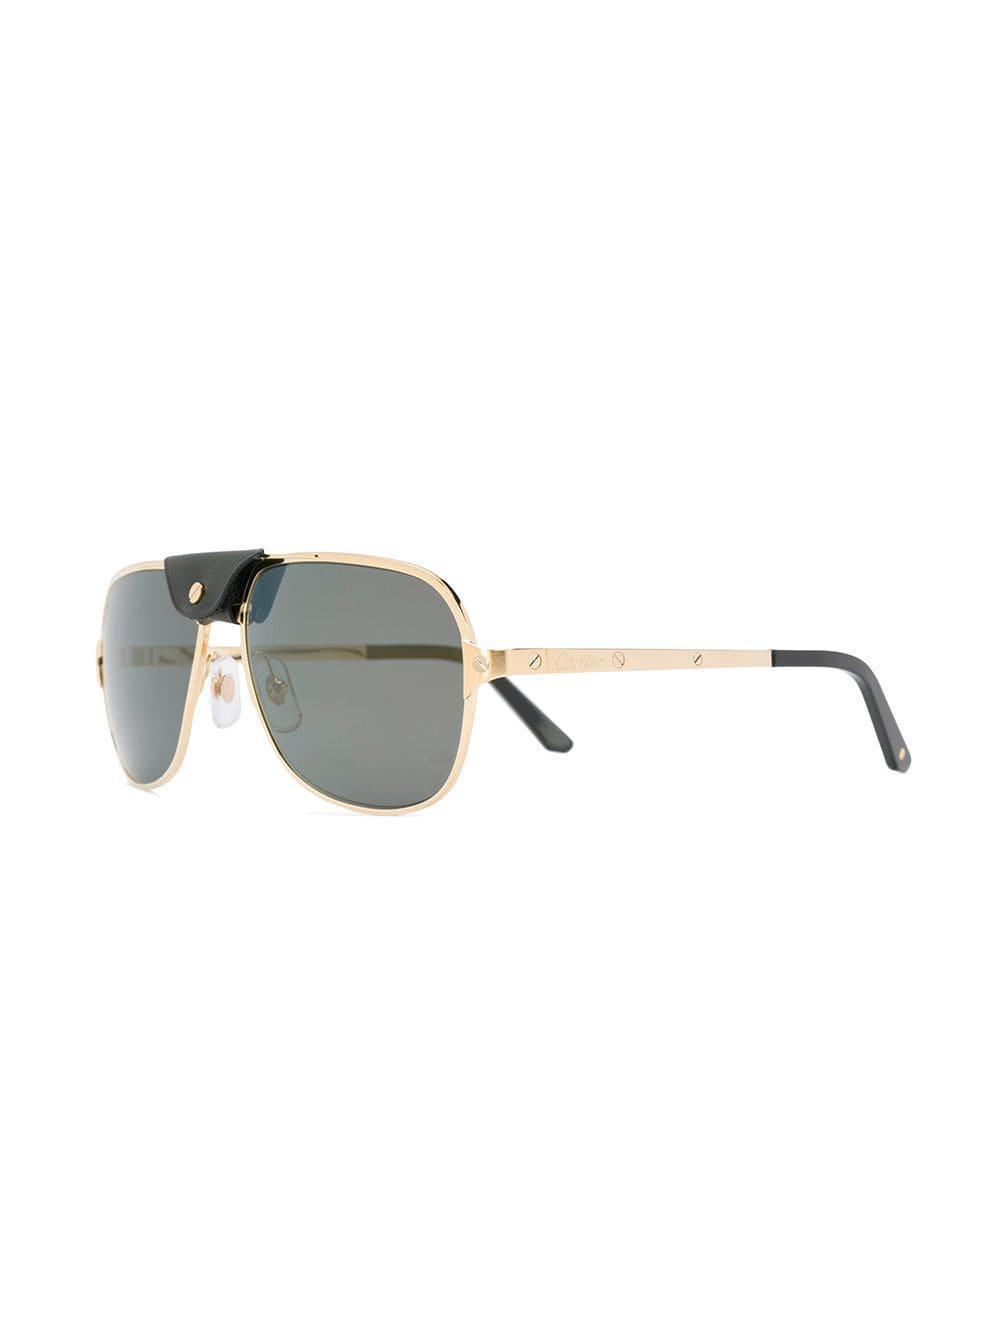 7a585f03ff50 Cartier Santos De Sunglasses in Metallic - Lyst